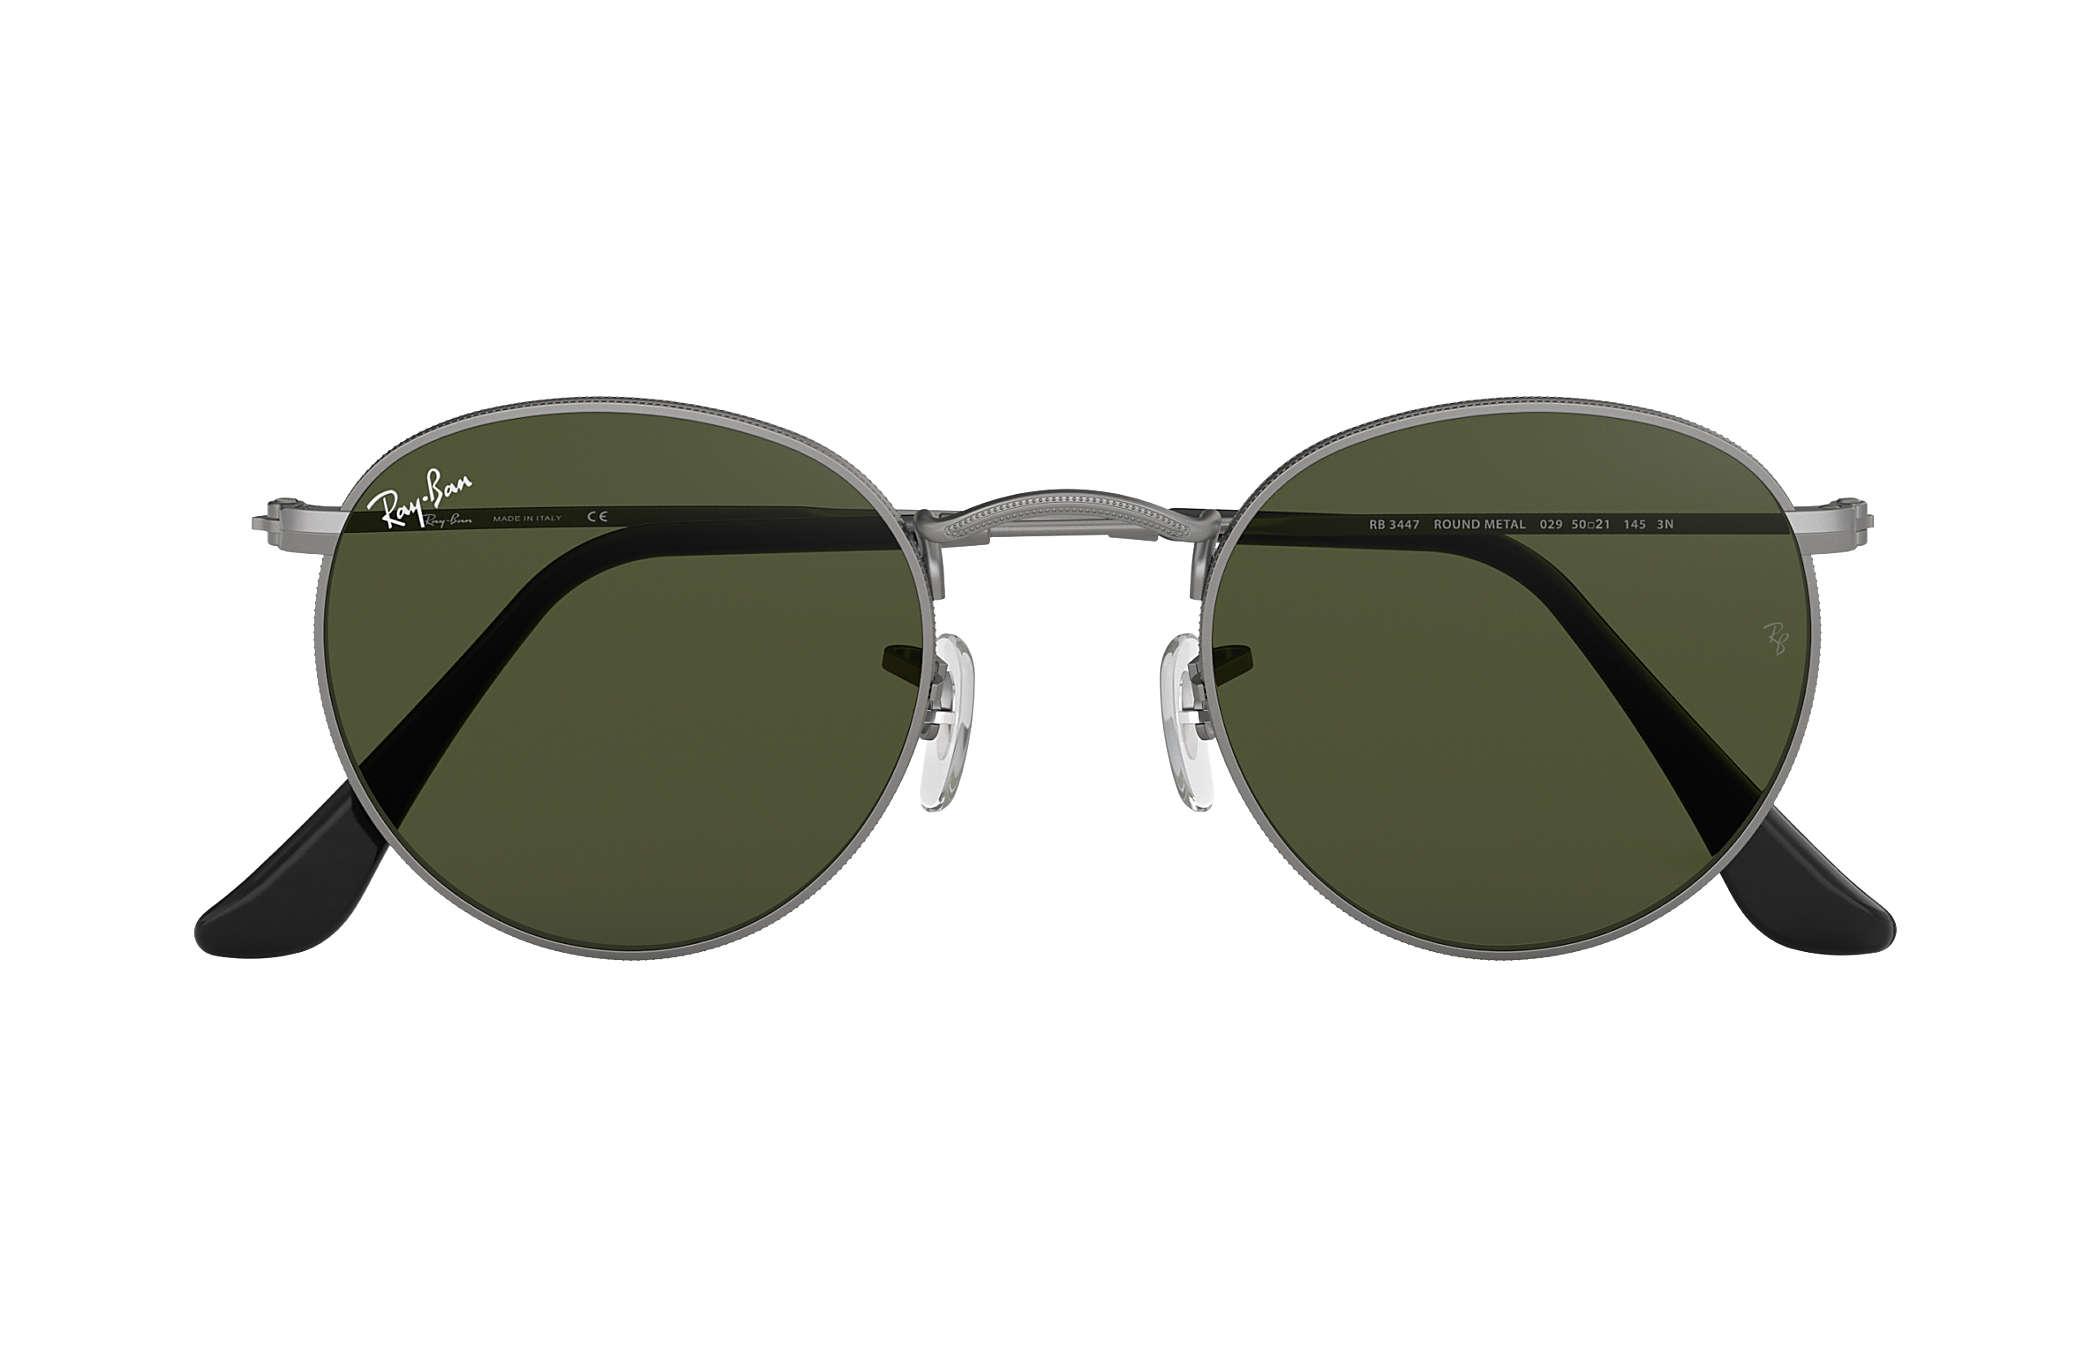 Ray-Ban Round Metal RB3447 Gunmetal - Metal - Green Lenses ... 6a990b2a4d7